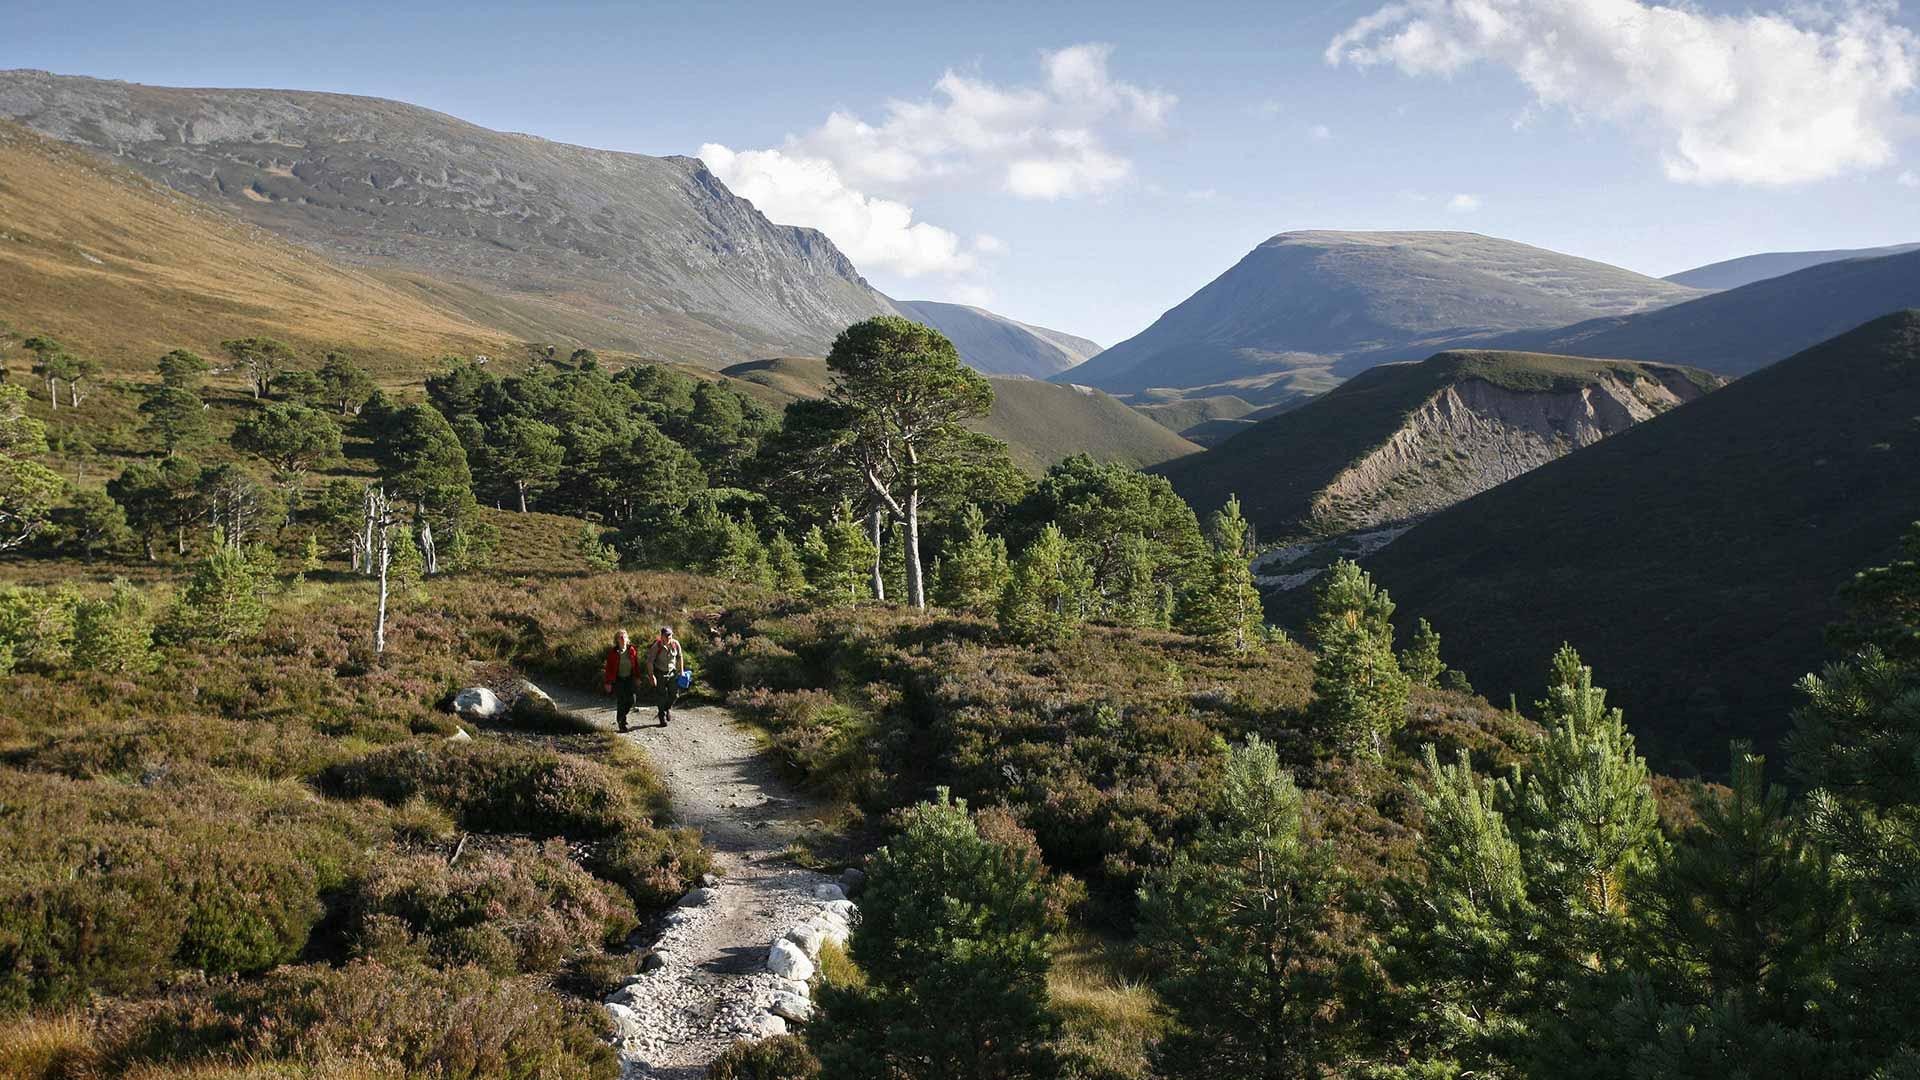 St andrews the scottish highlands 7 days 6 nights scotland self drive tours nordic visitor - Highland park wallpaper ...